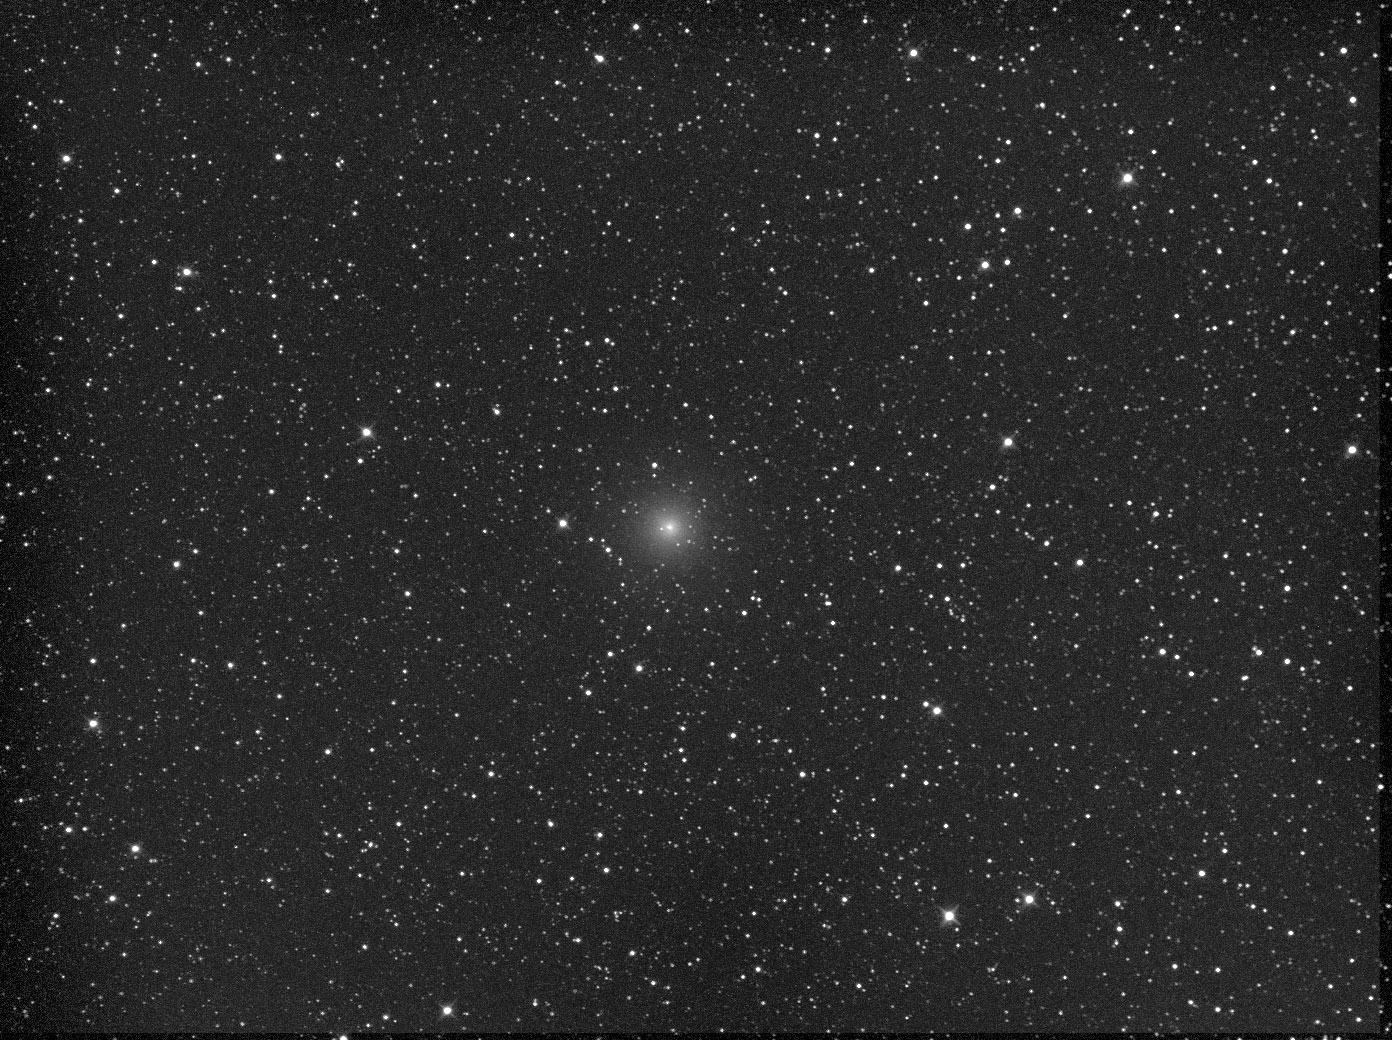 Objevené a znovuobjevené komety v červenci 2016